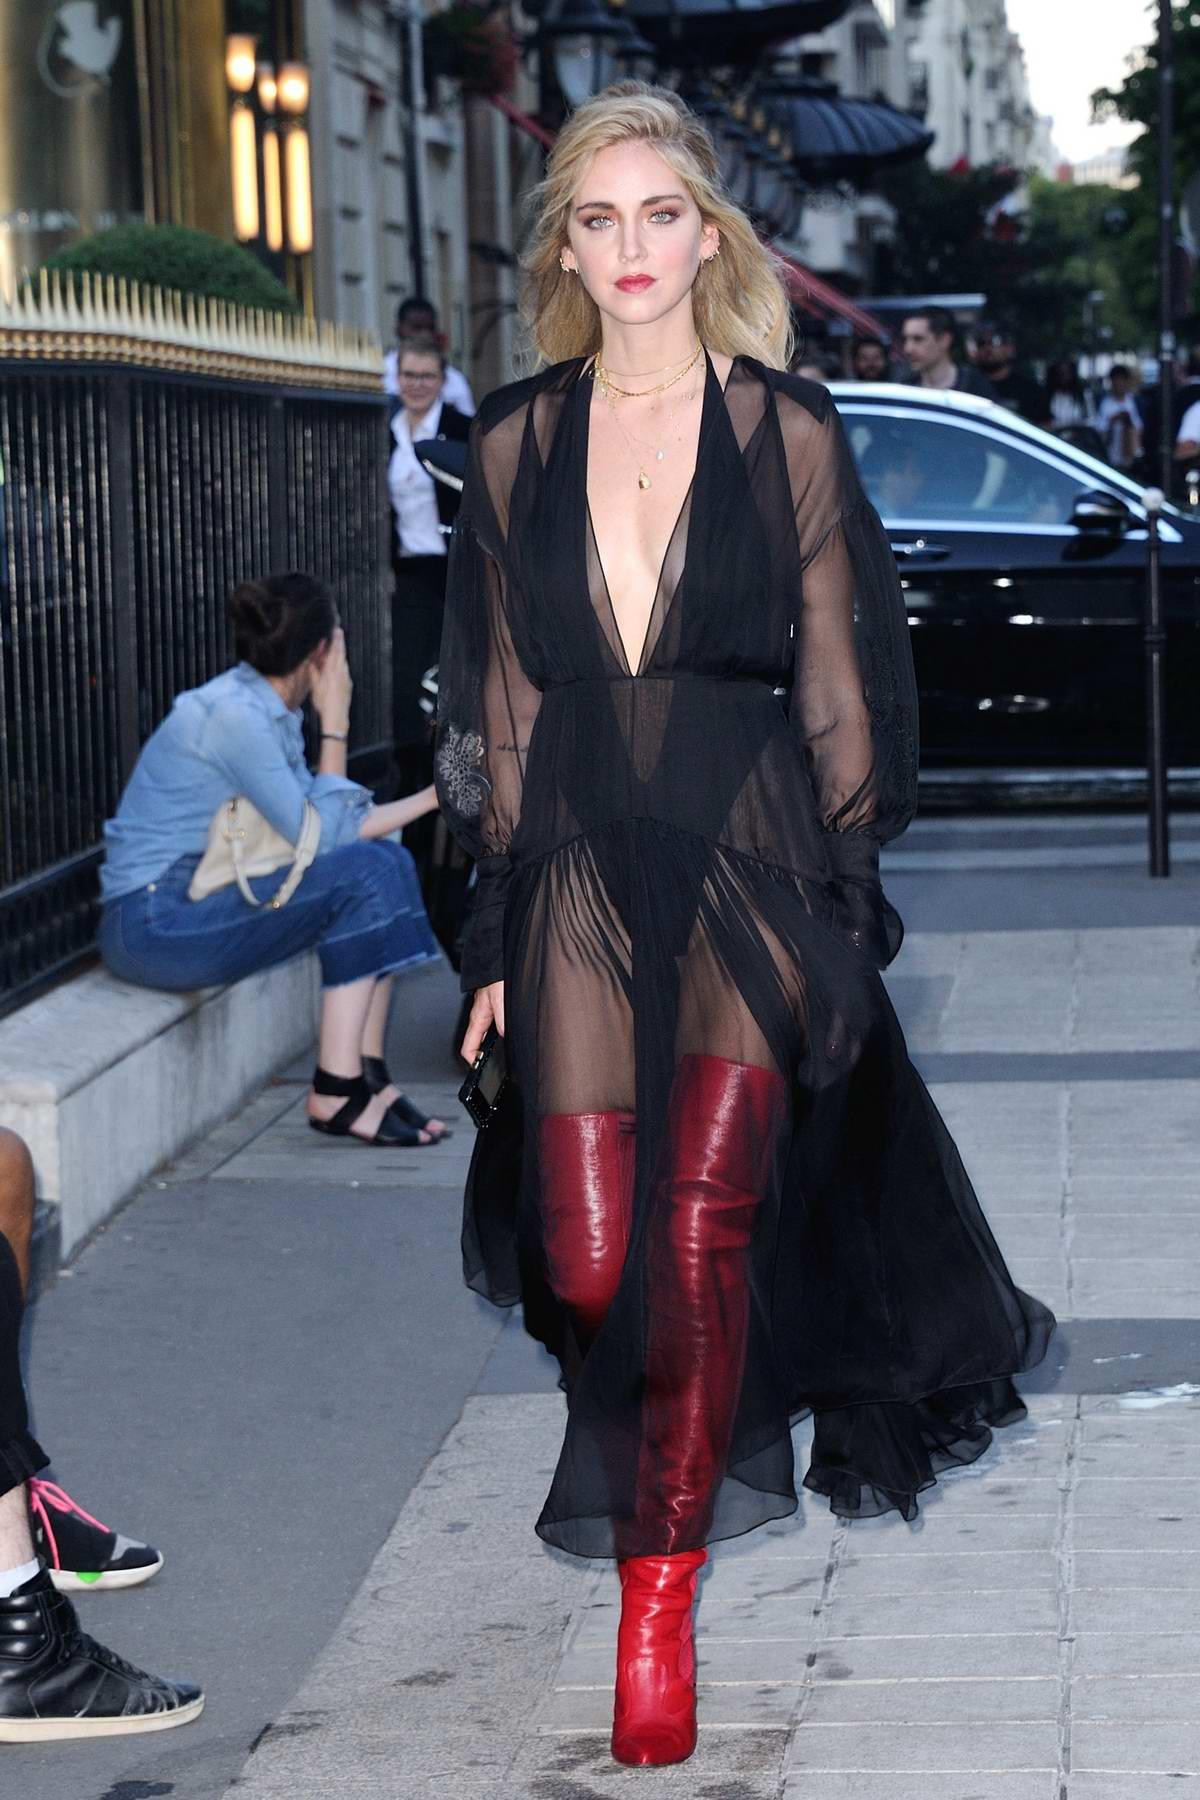 Chiara Ferragni leaving Fendi Fashion Show at Paris Fashion Week in Paris, France